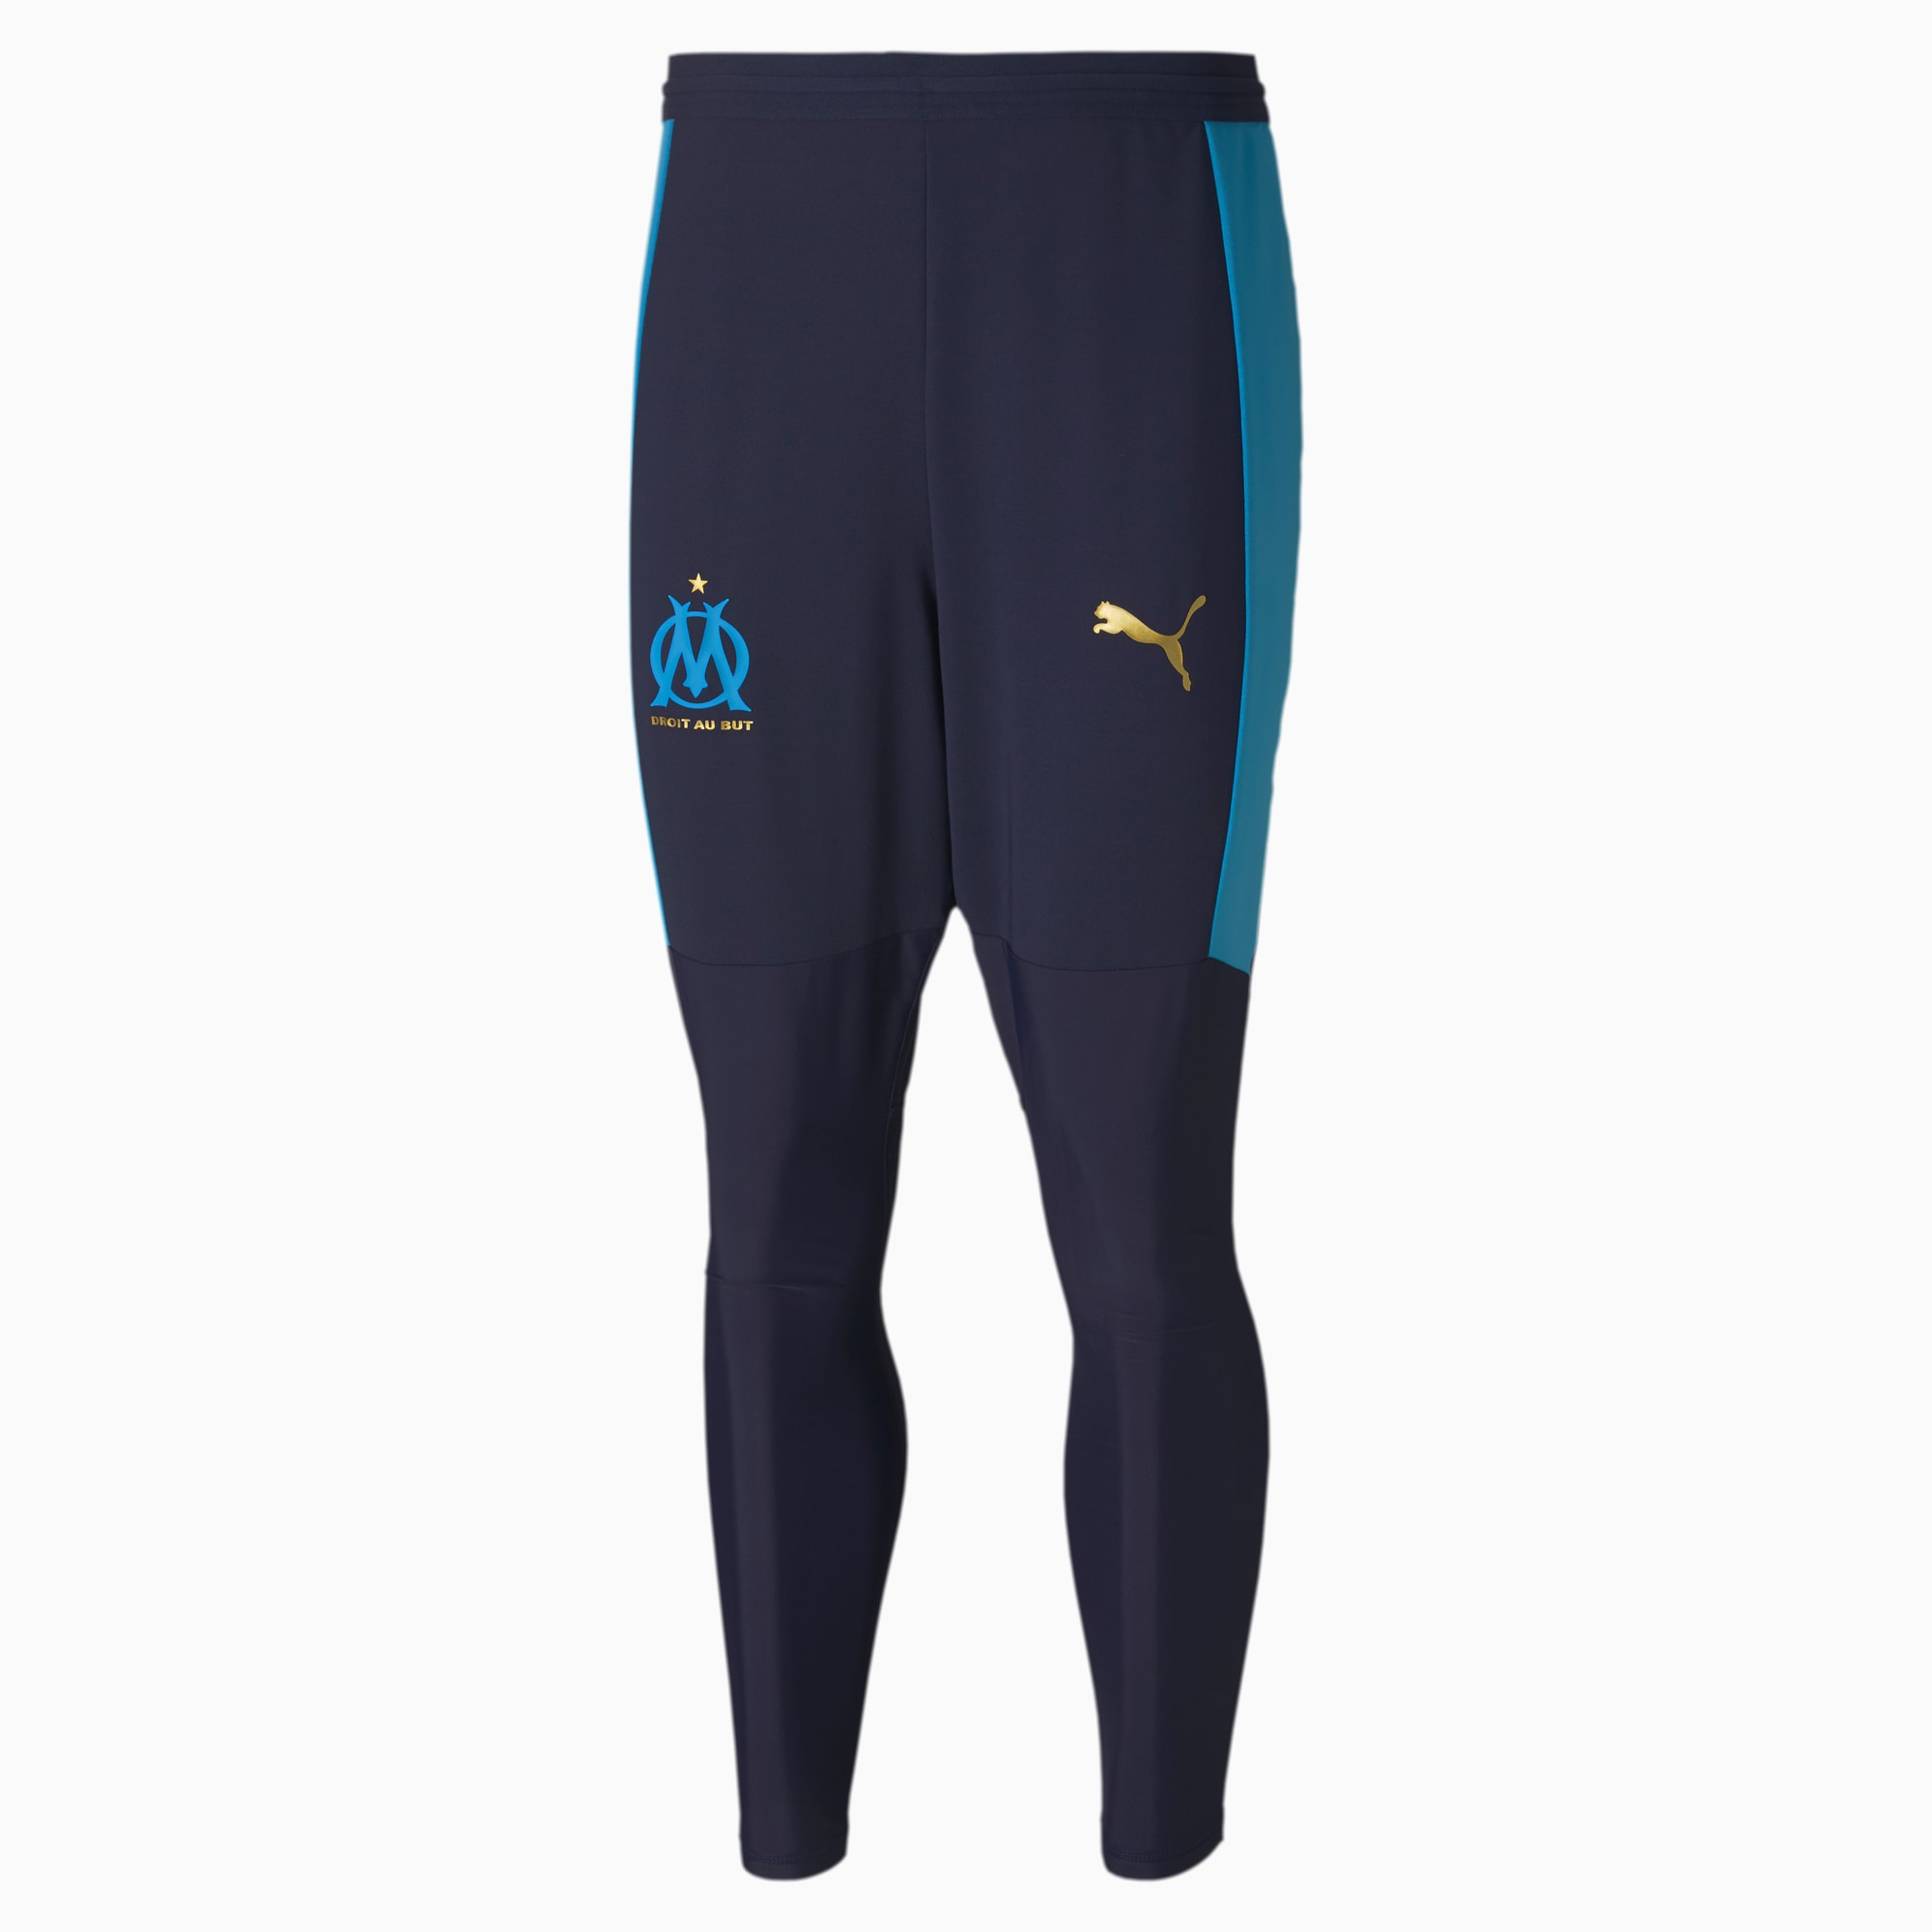 puma -  Olympique de Marseille Pro Herren Trainingshose | Blau | Größe: L